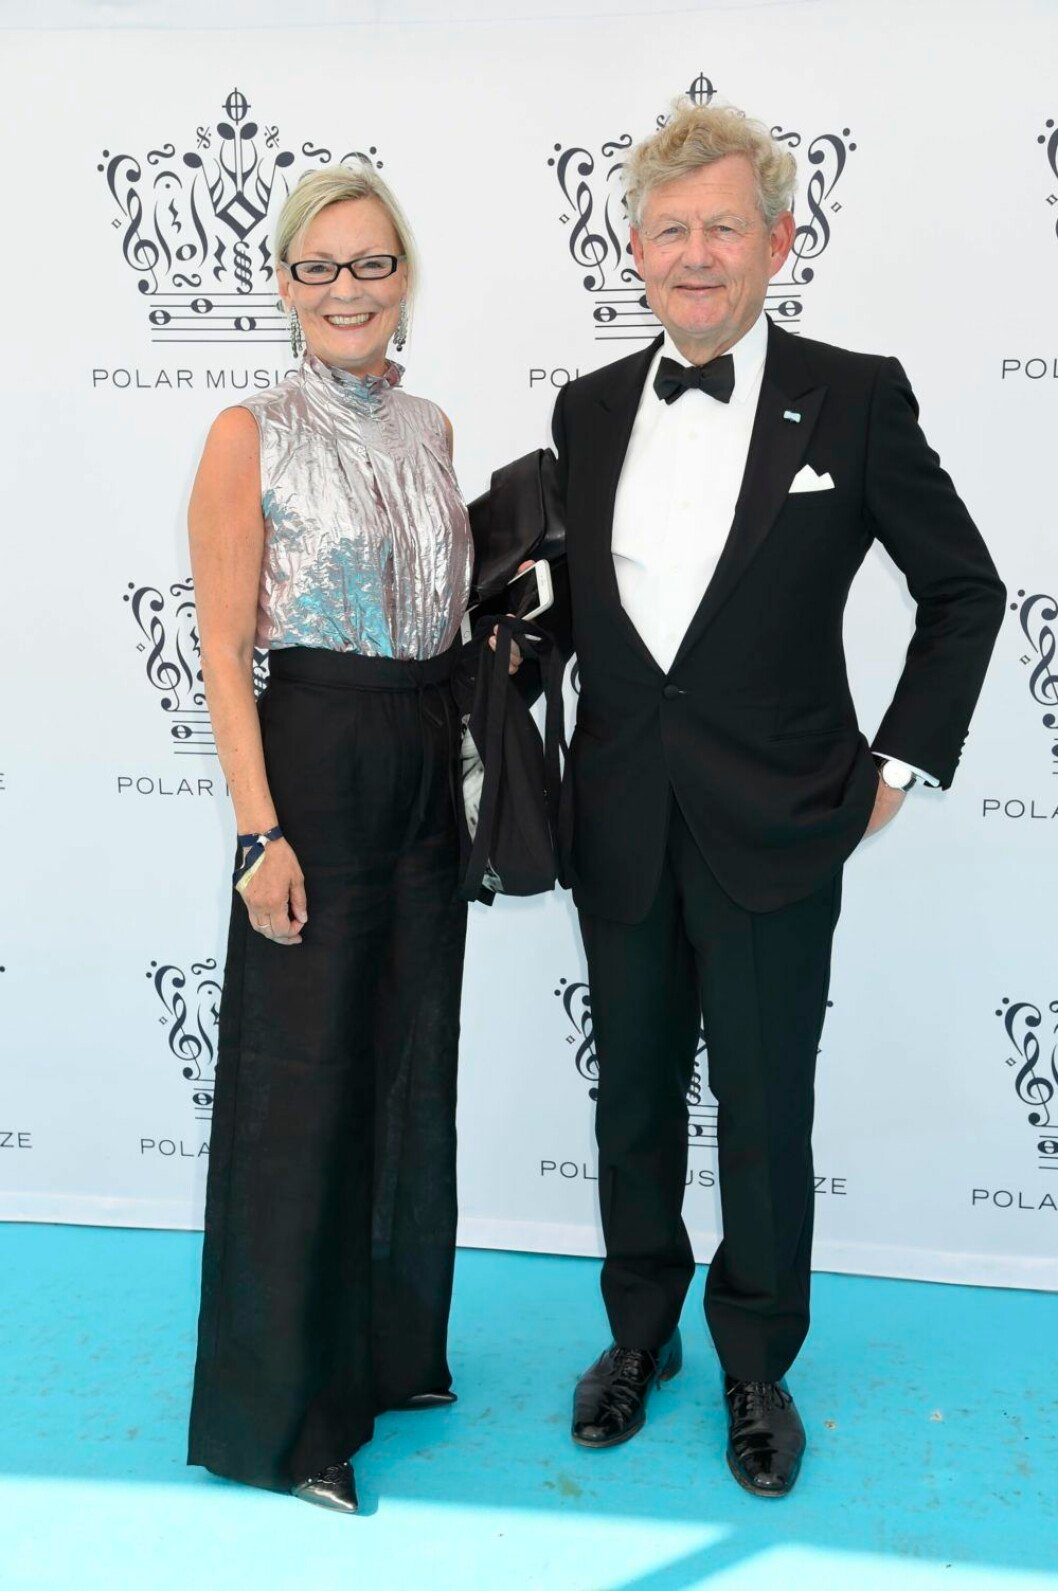 Annika Levin, Jacob Wallenberg på röda mattan på Polarpriset.